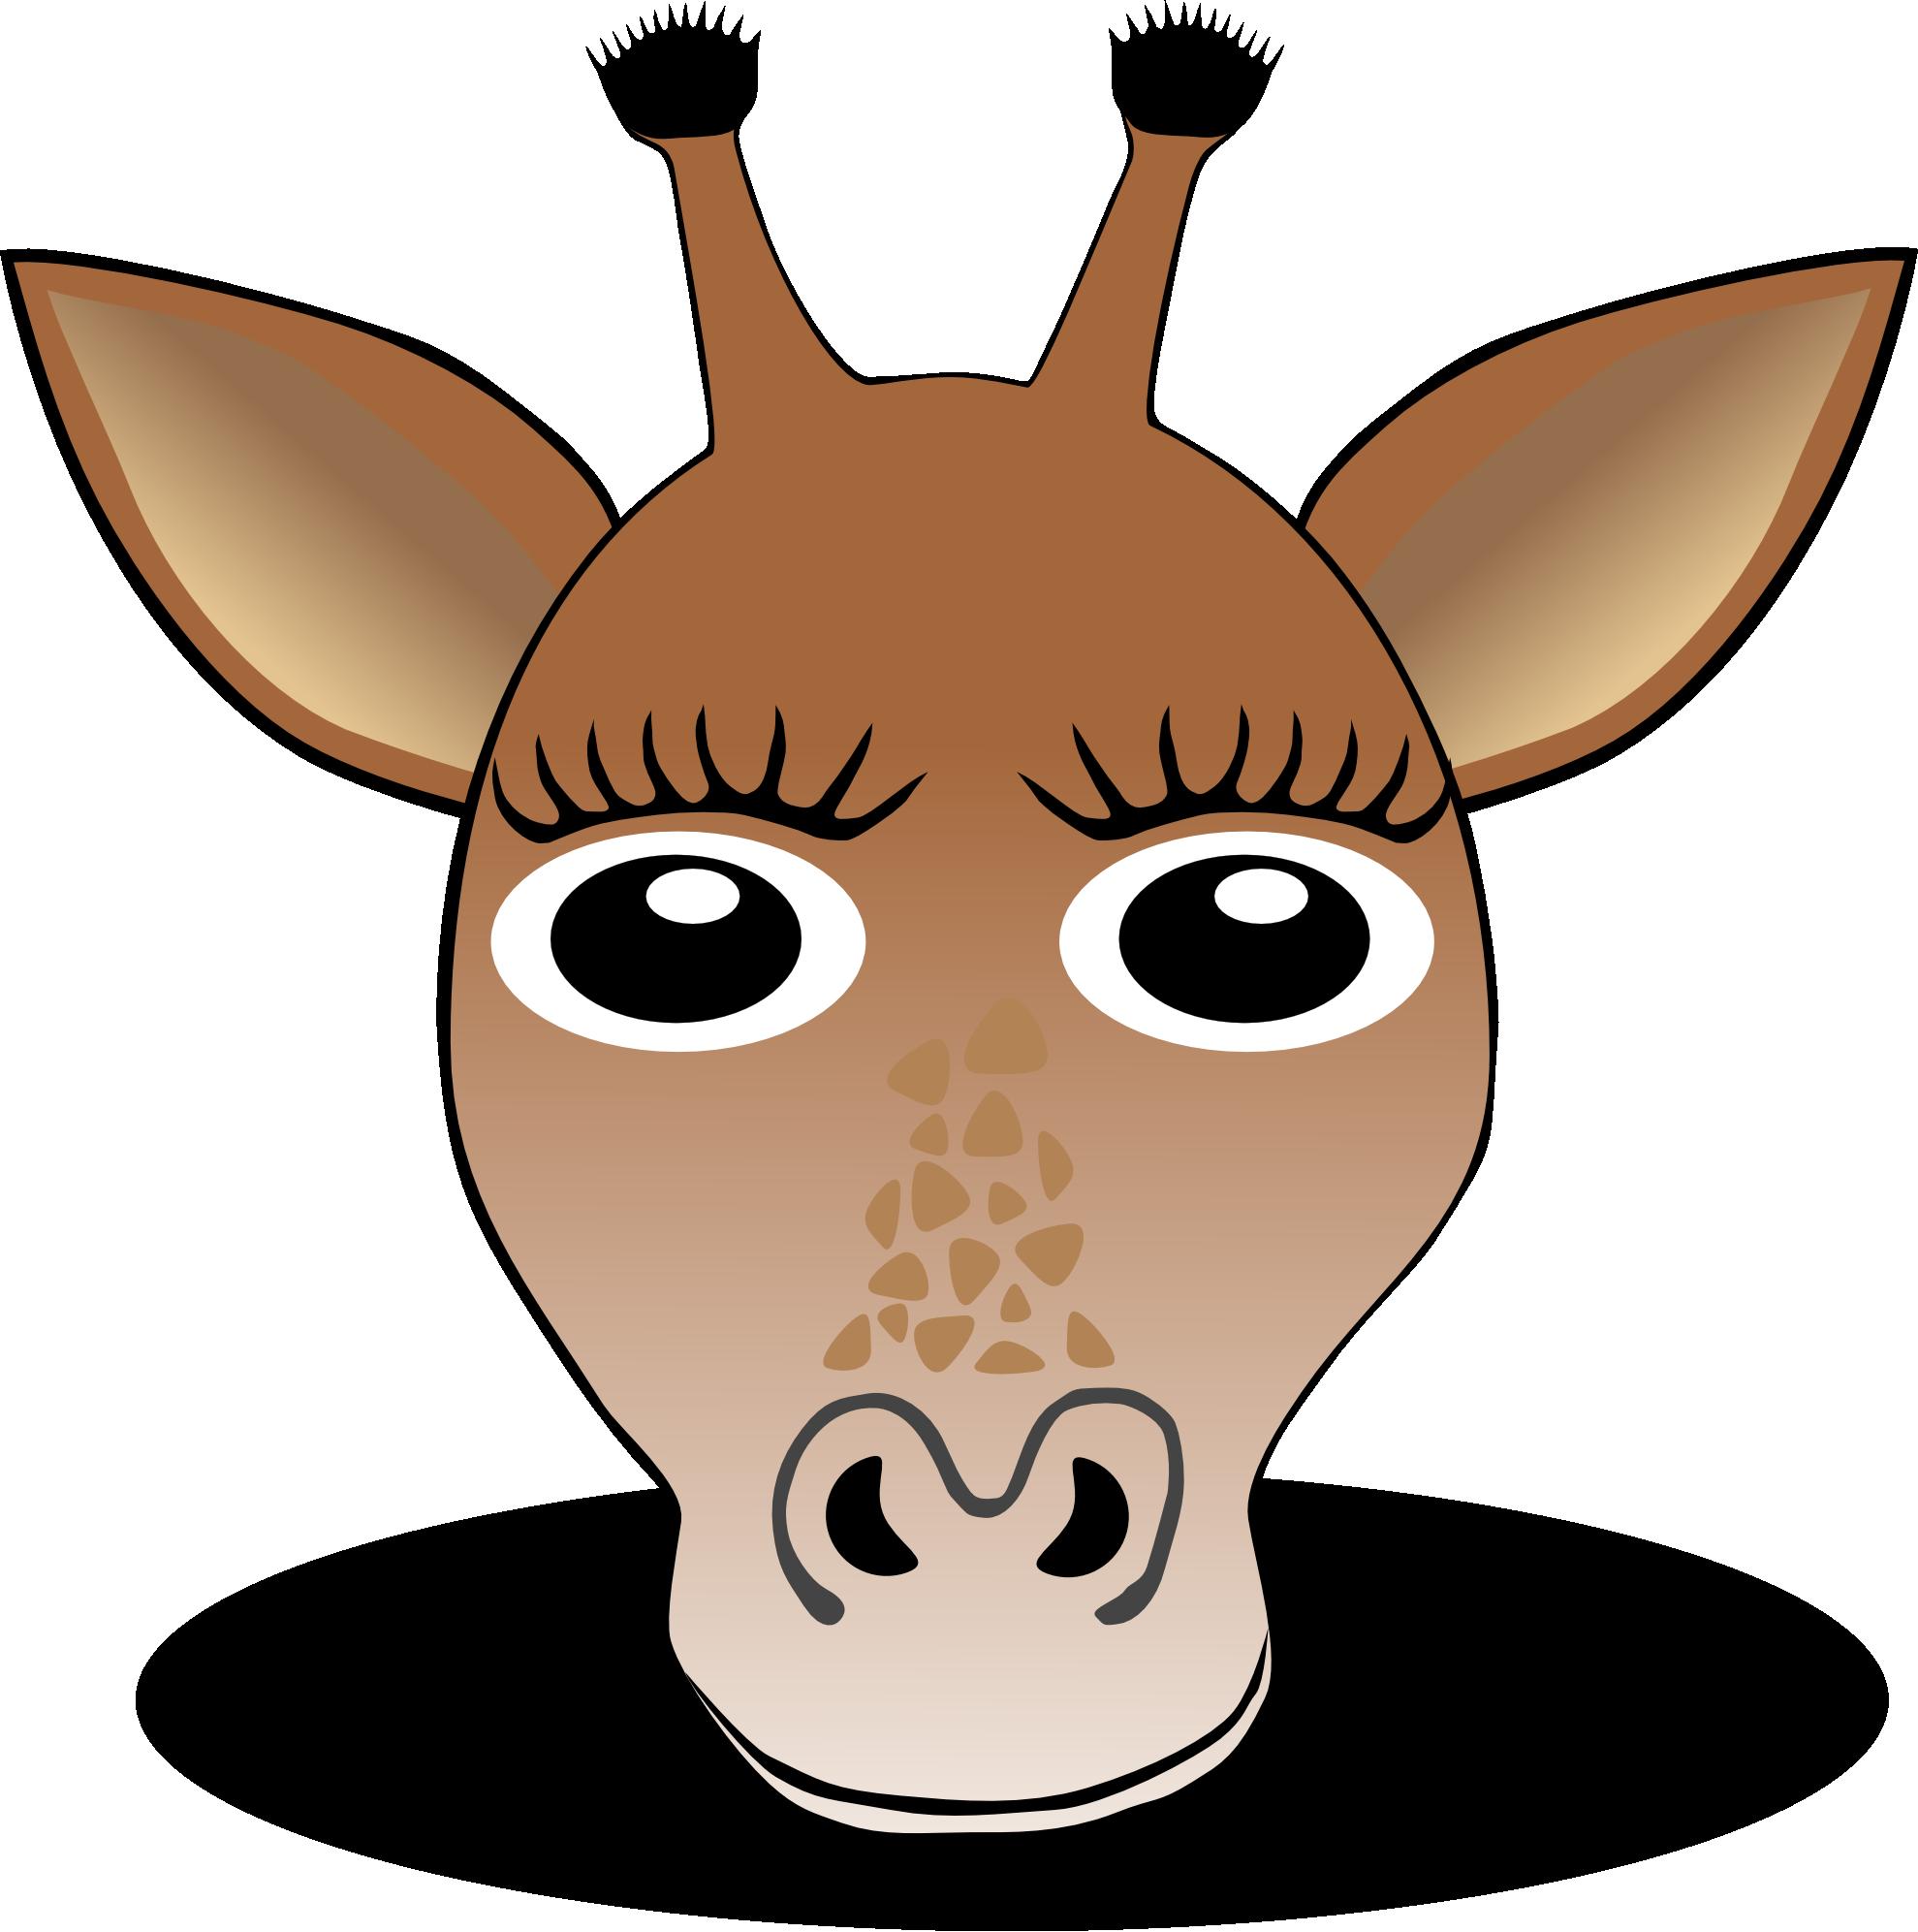 Image of Giraffe Clipart #7664, Clip Art Giraffe 1 Face Christmas.